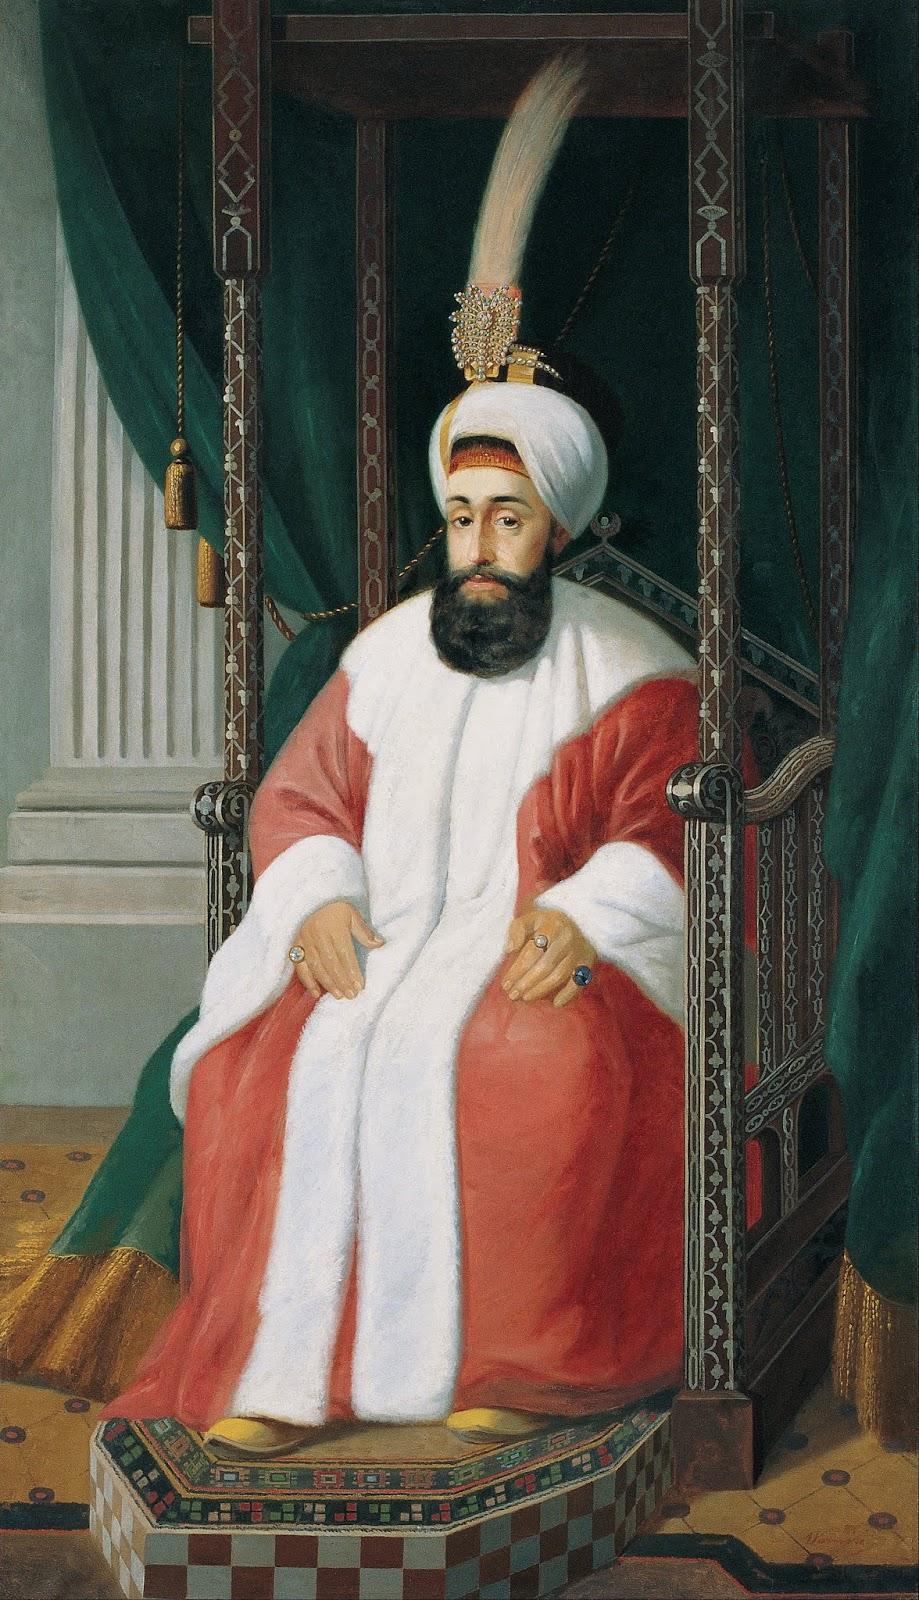 Gazi Halife, Sultan III. Selim,Selīm-i sālis Han, سليم ثالث